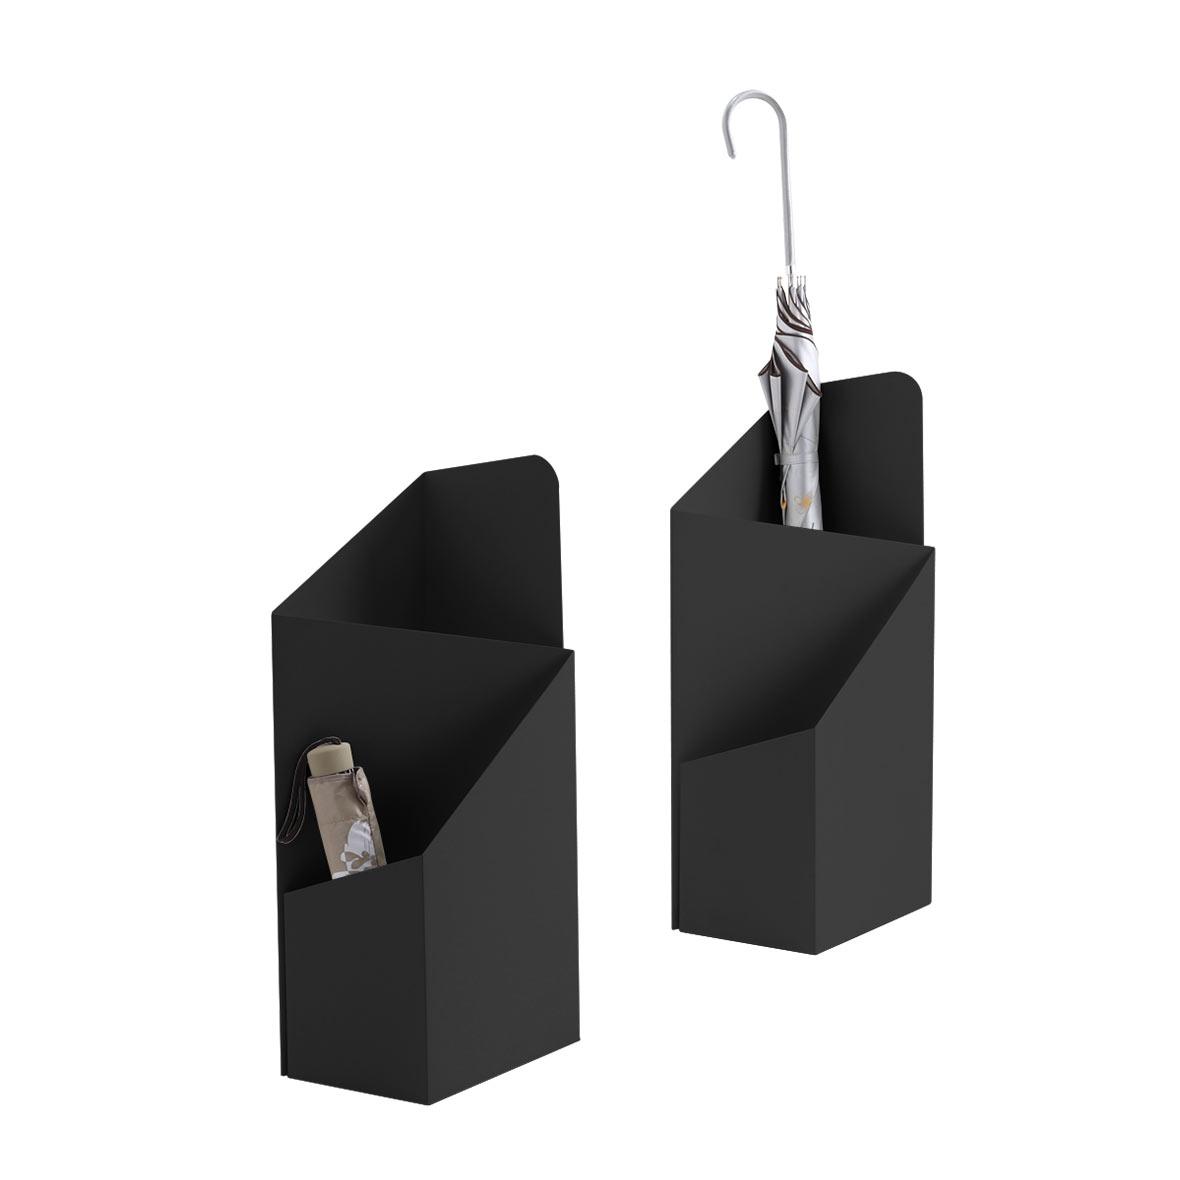 schirmst nder via mit tropfschale. Black Bedroom Furniture Sets. Home Design Ideas